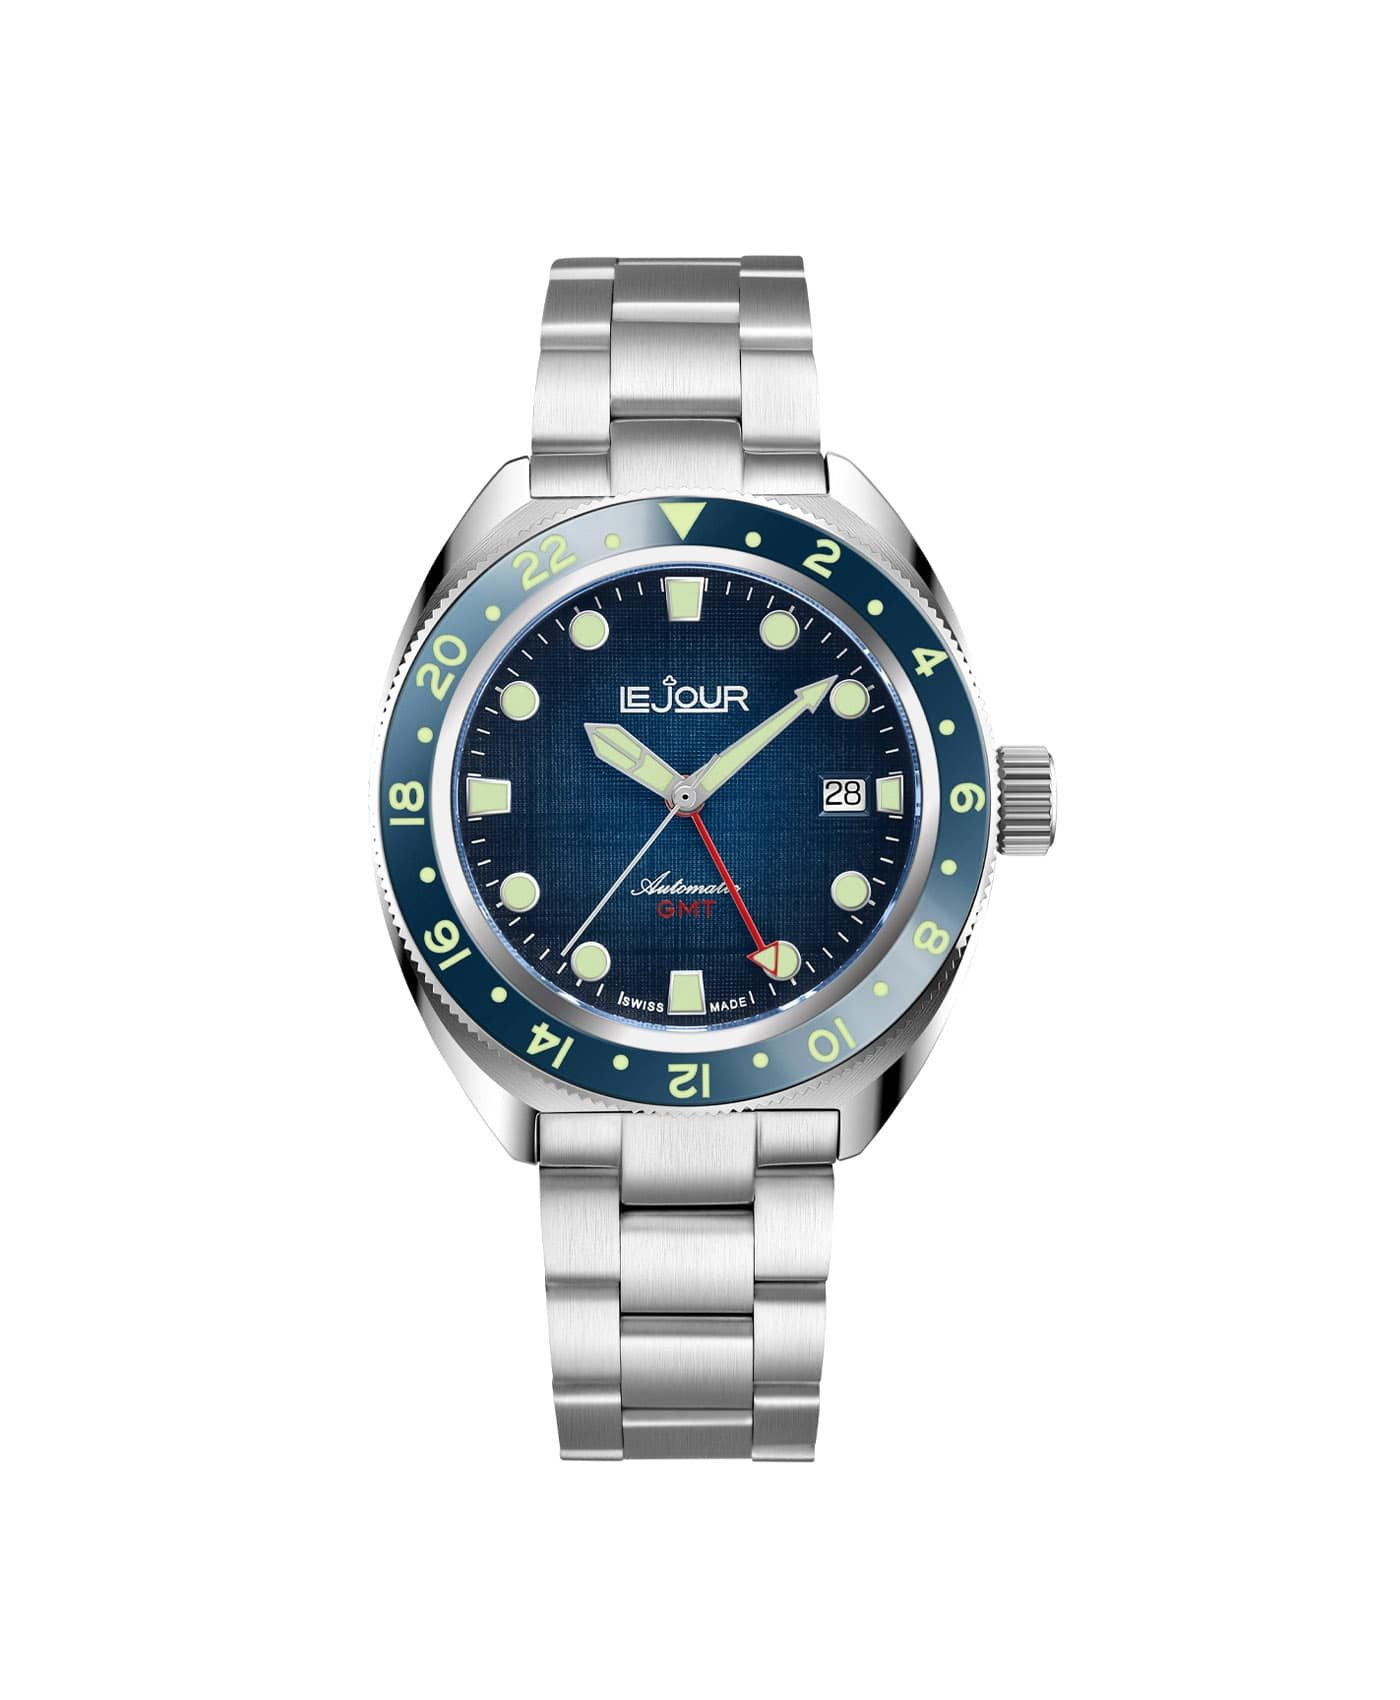 LJ-HH-GMT-002 textured blue dial